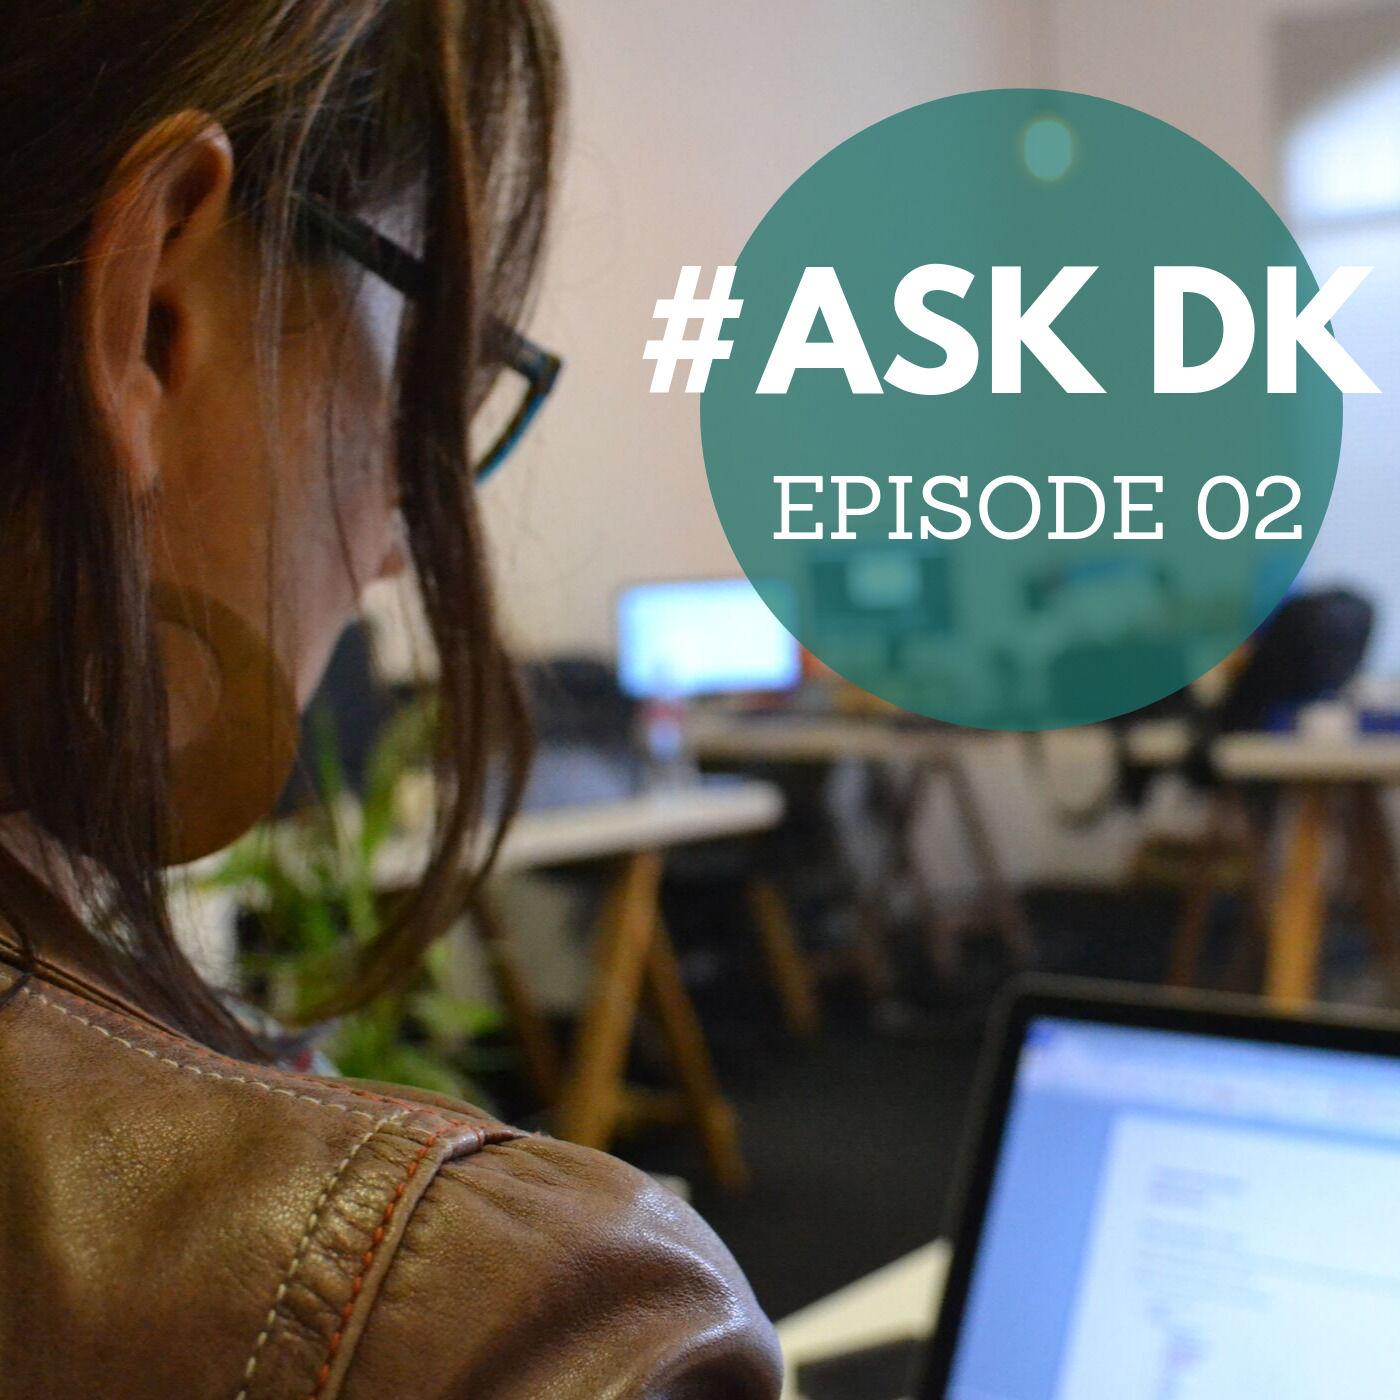 #AskDK Show - Season 1 Episode 02   Your First Six Months as an Entrepreneur